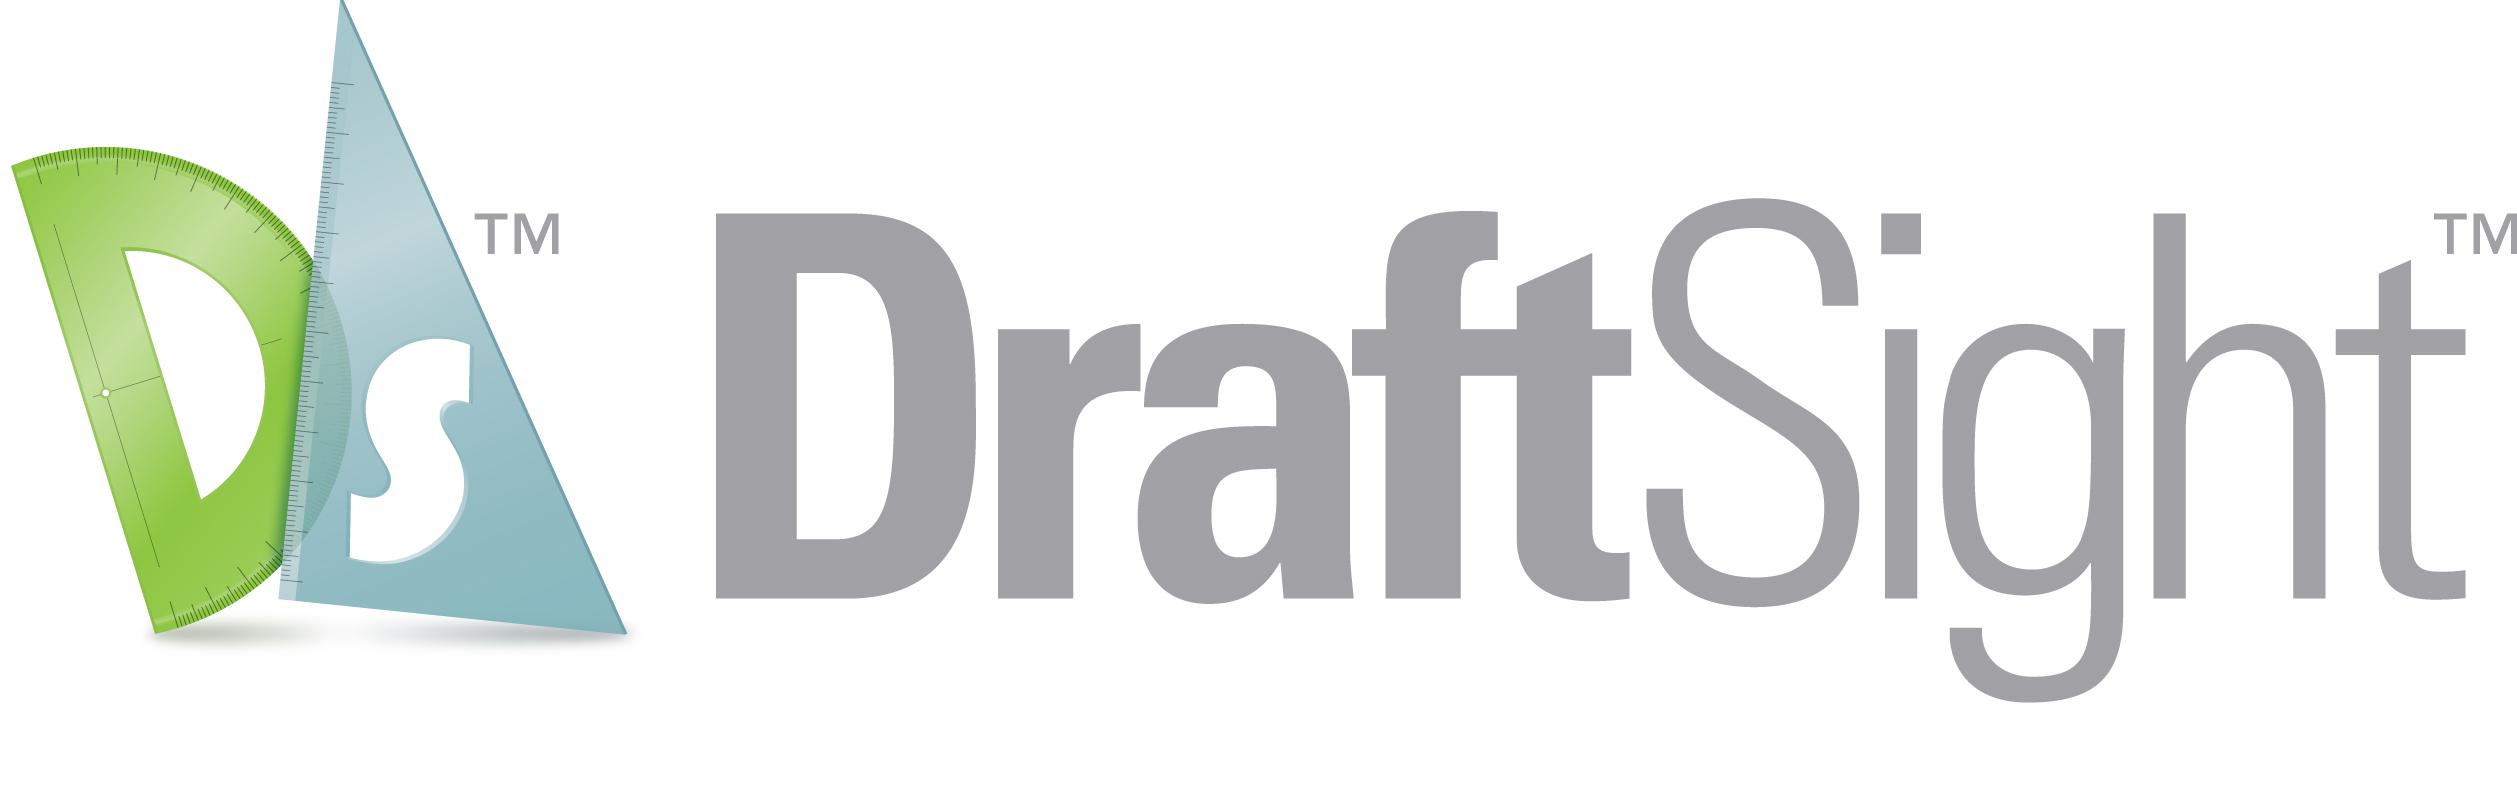 Draftsight Free 2d Cad Editor The Engatech Blog